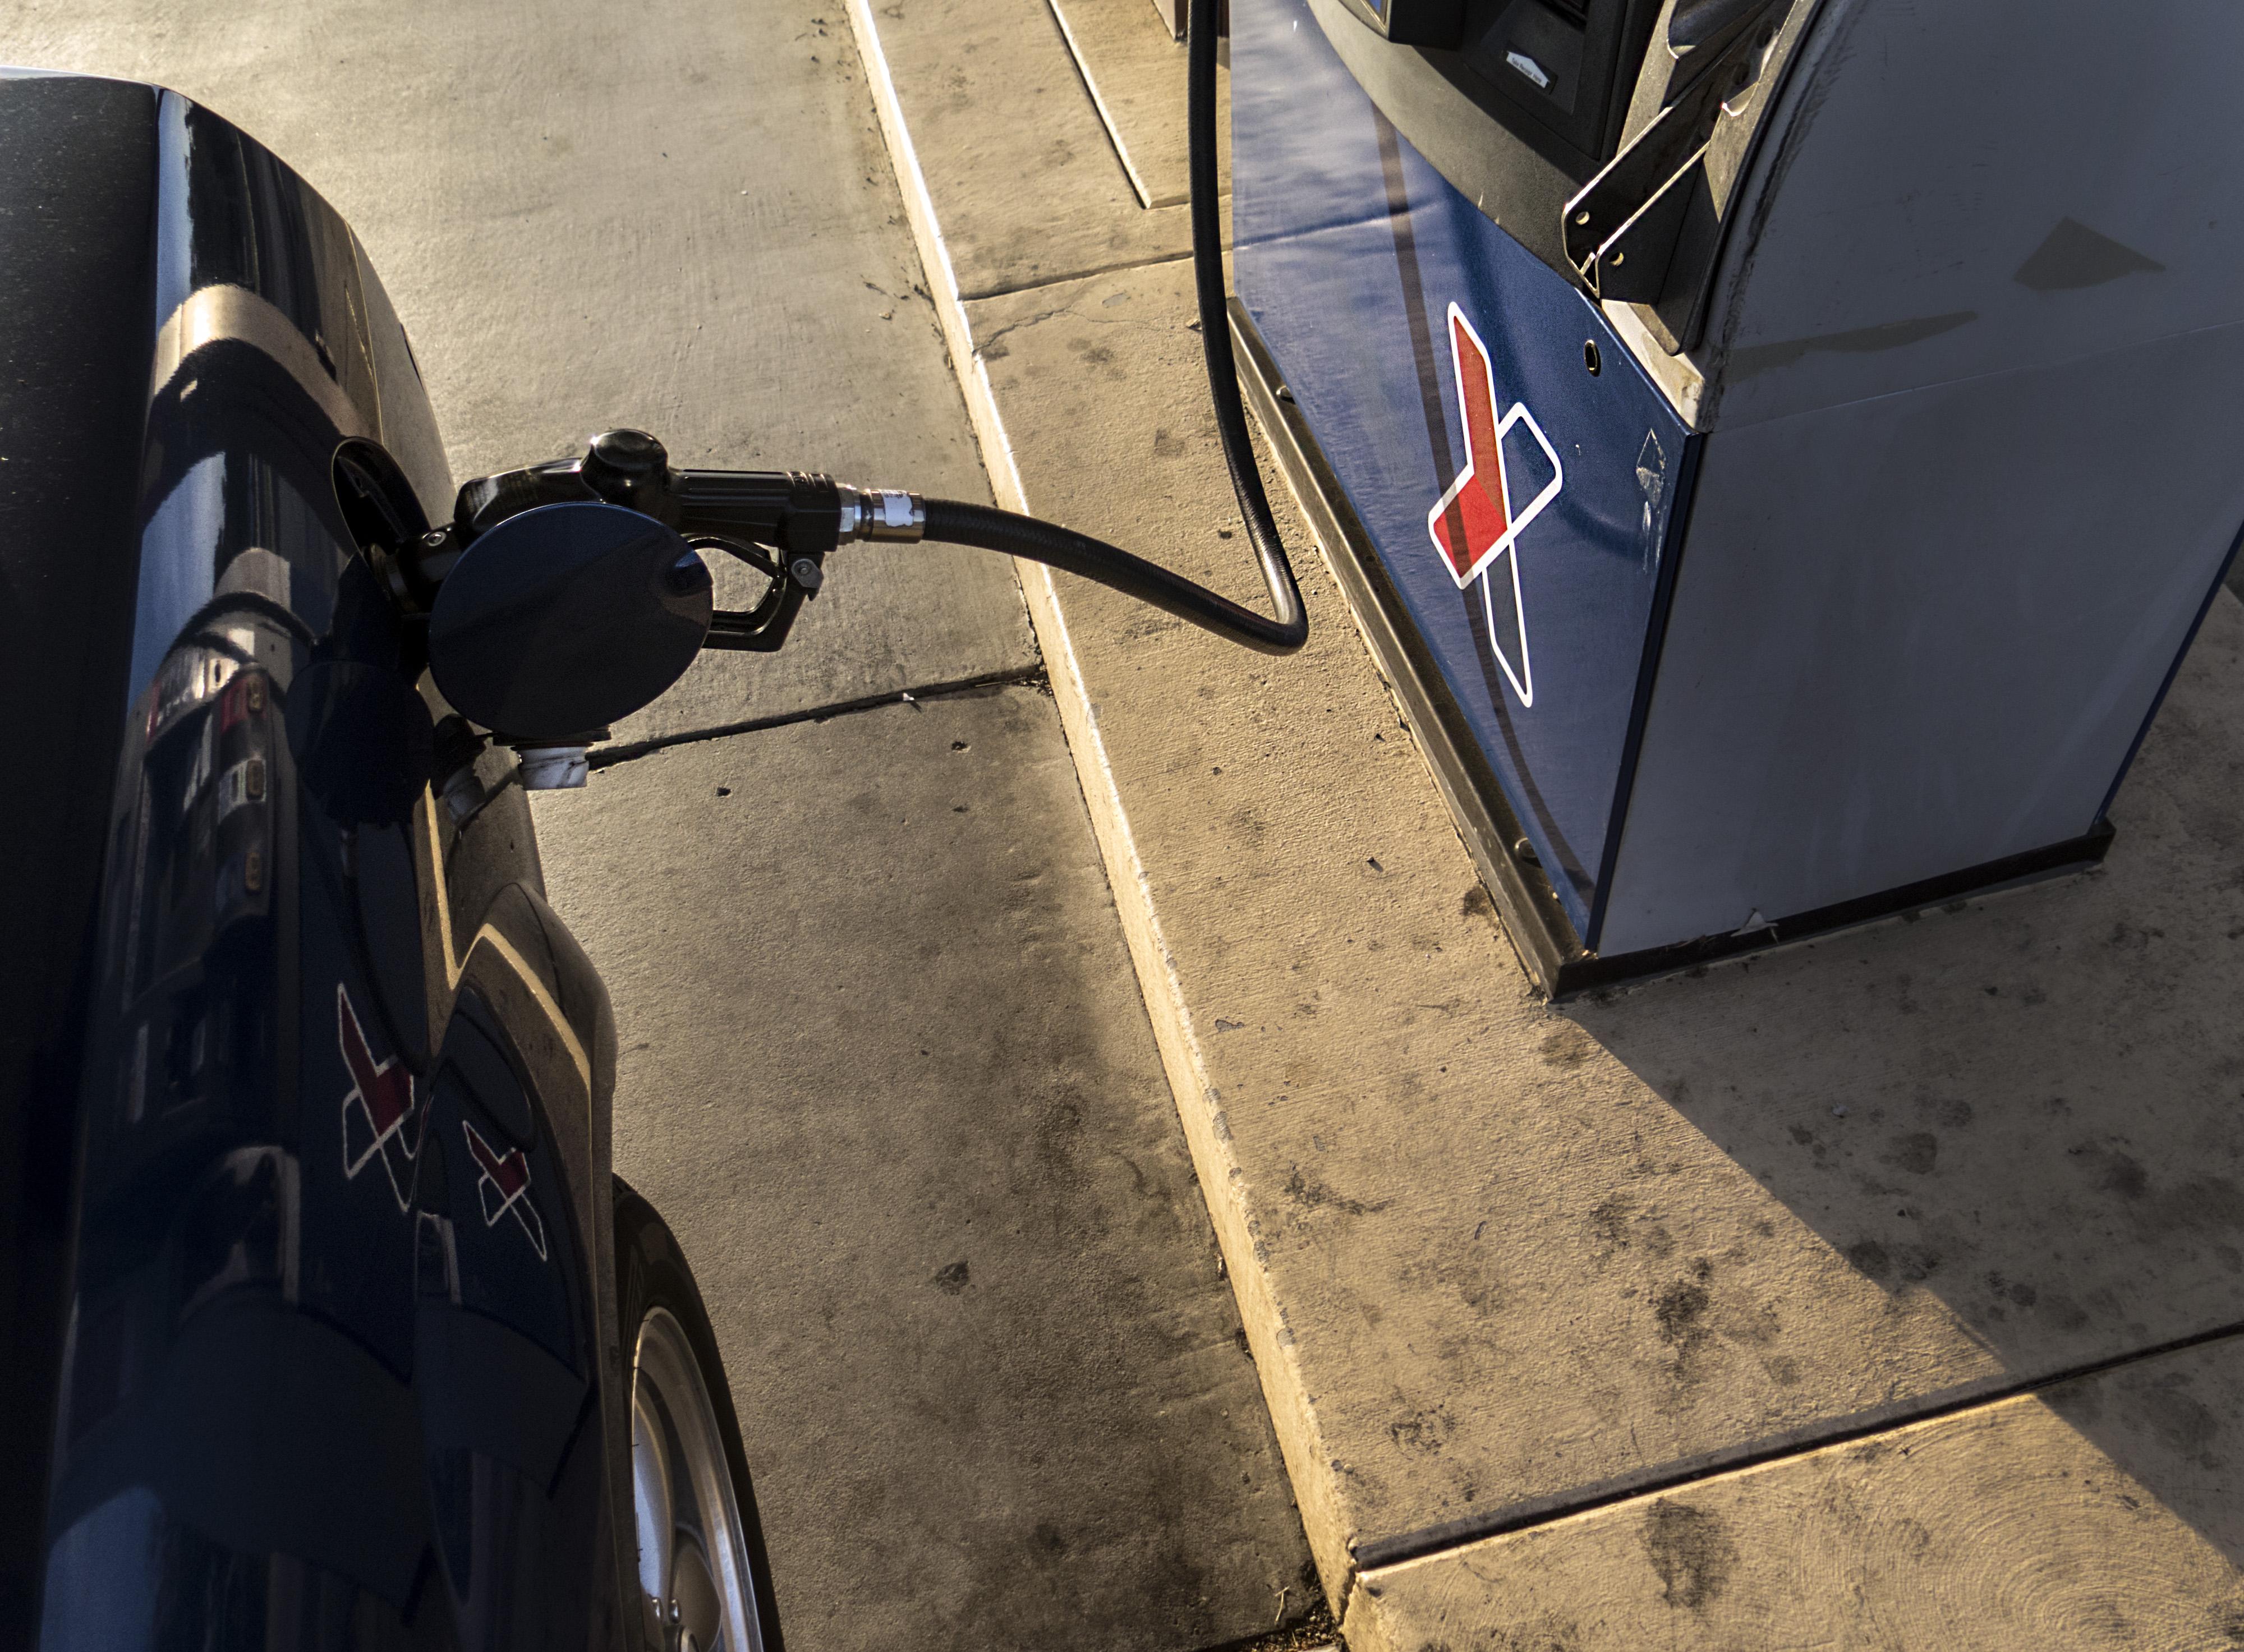 Fotos gratis : rueda, bicicleta, transporte, vehículo, azul, negro ...